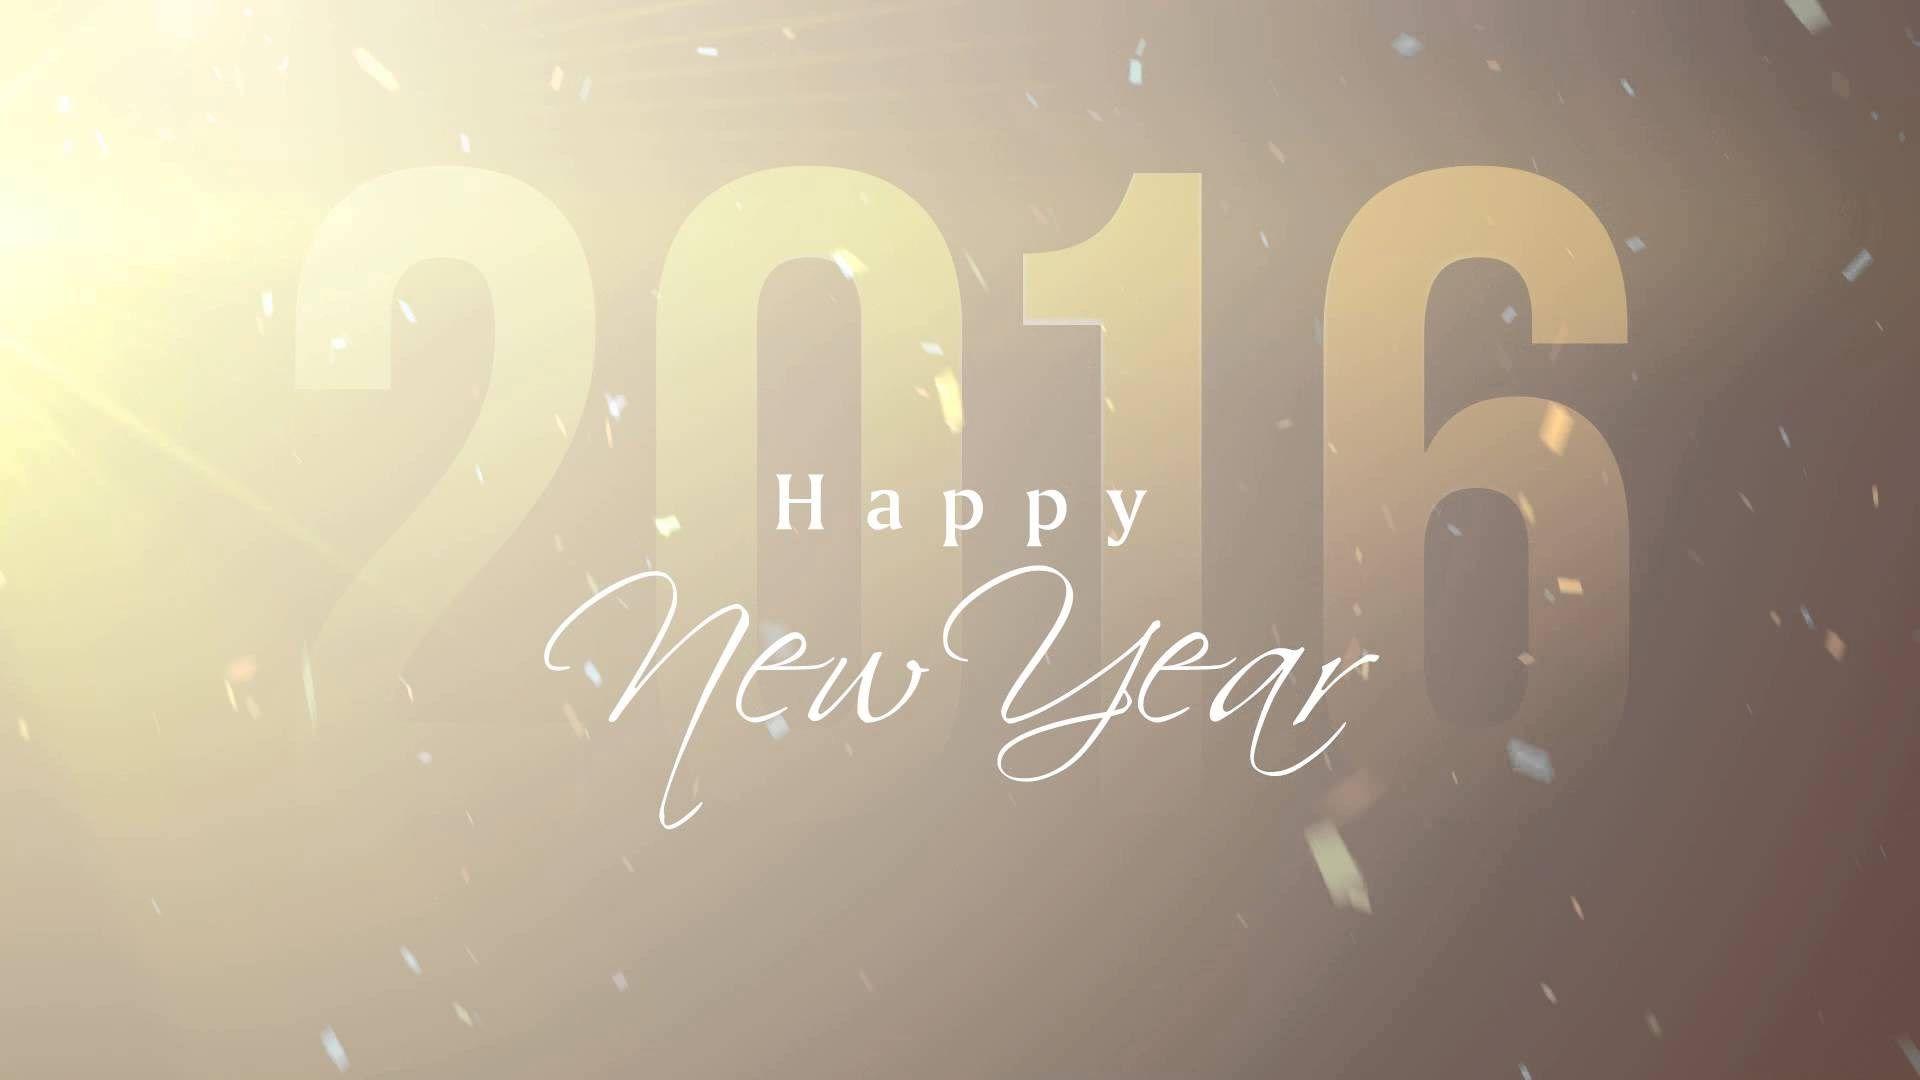 new year 2016 free desktop wallpaper Maxwell